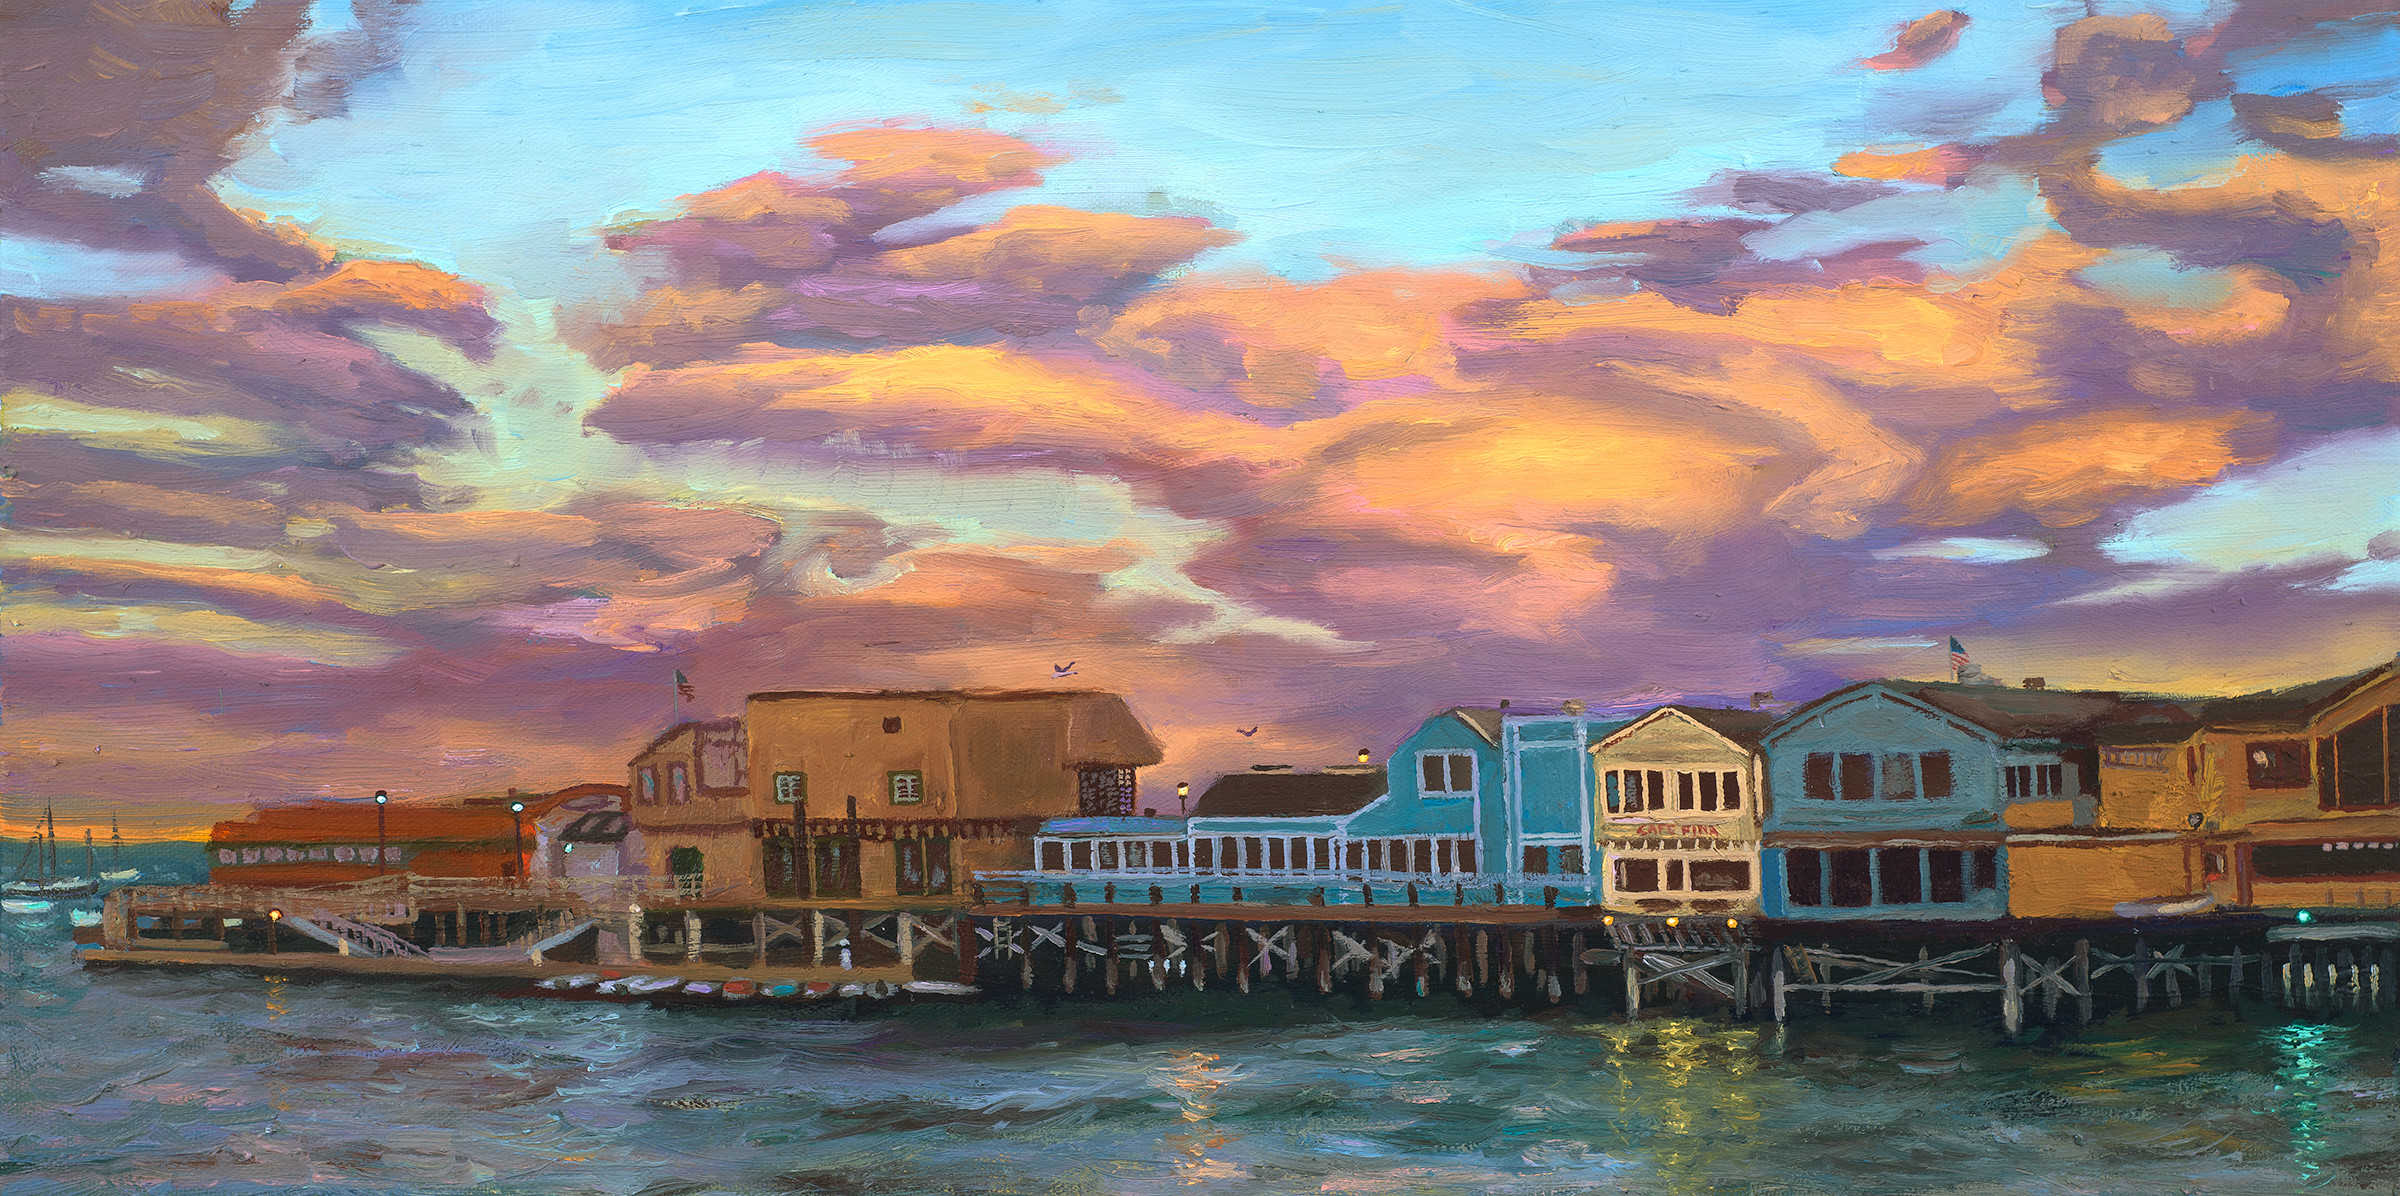 Scott Jacobs | United States | Scott Jacobs Gallery